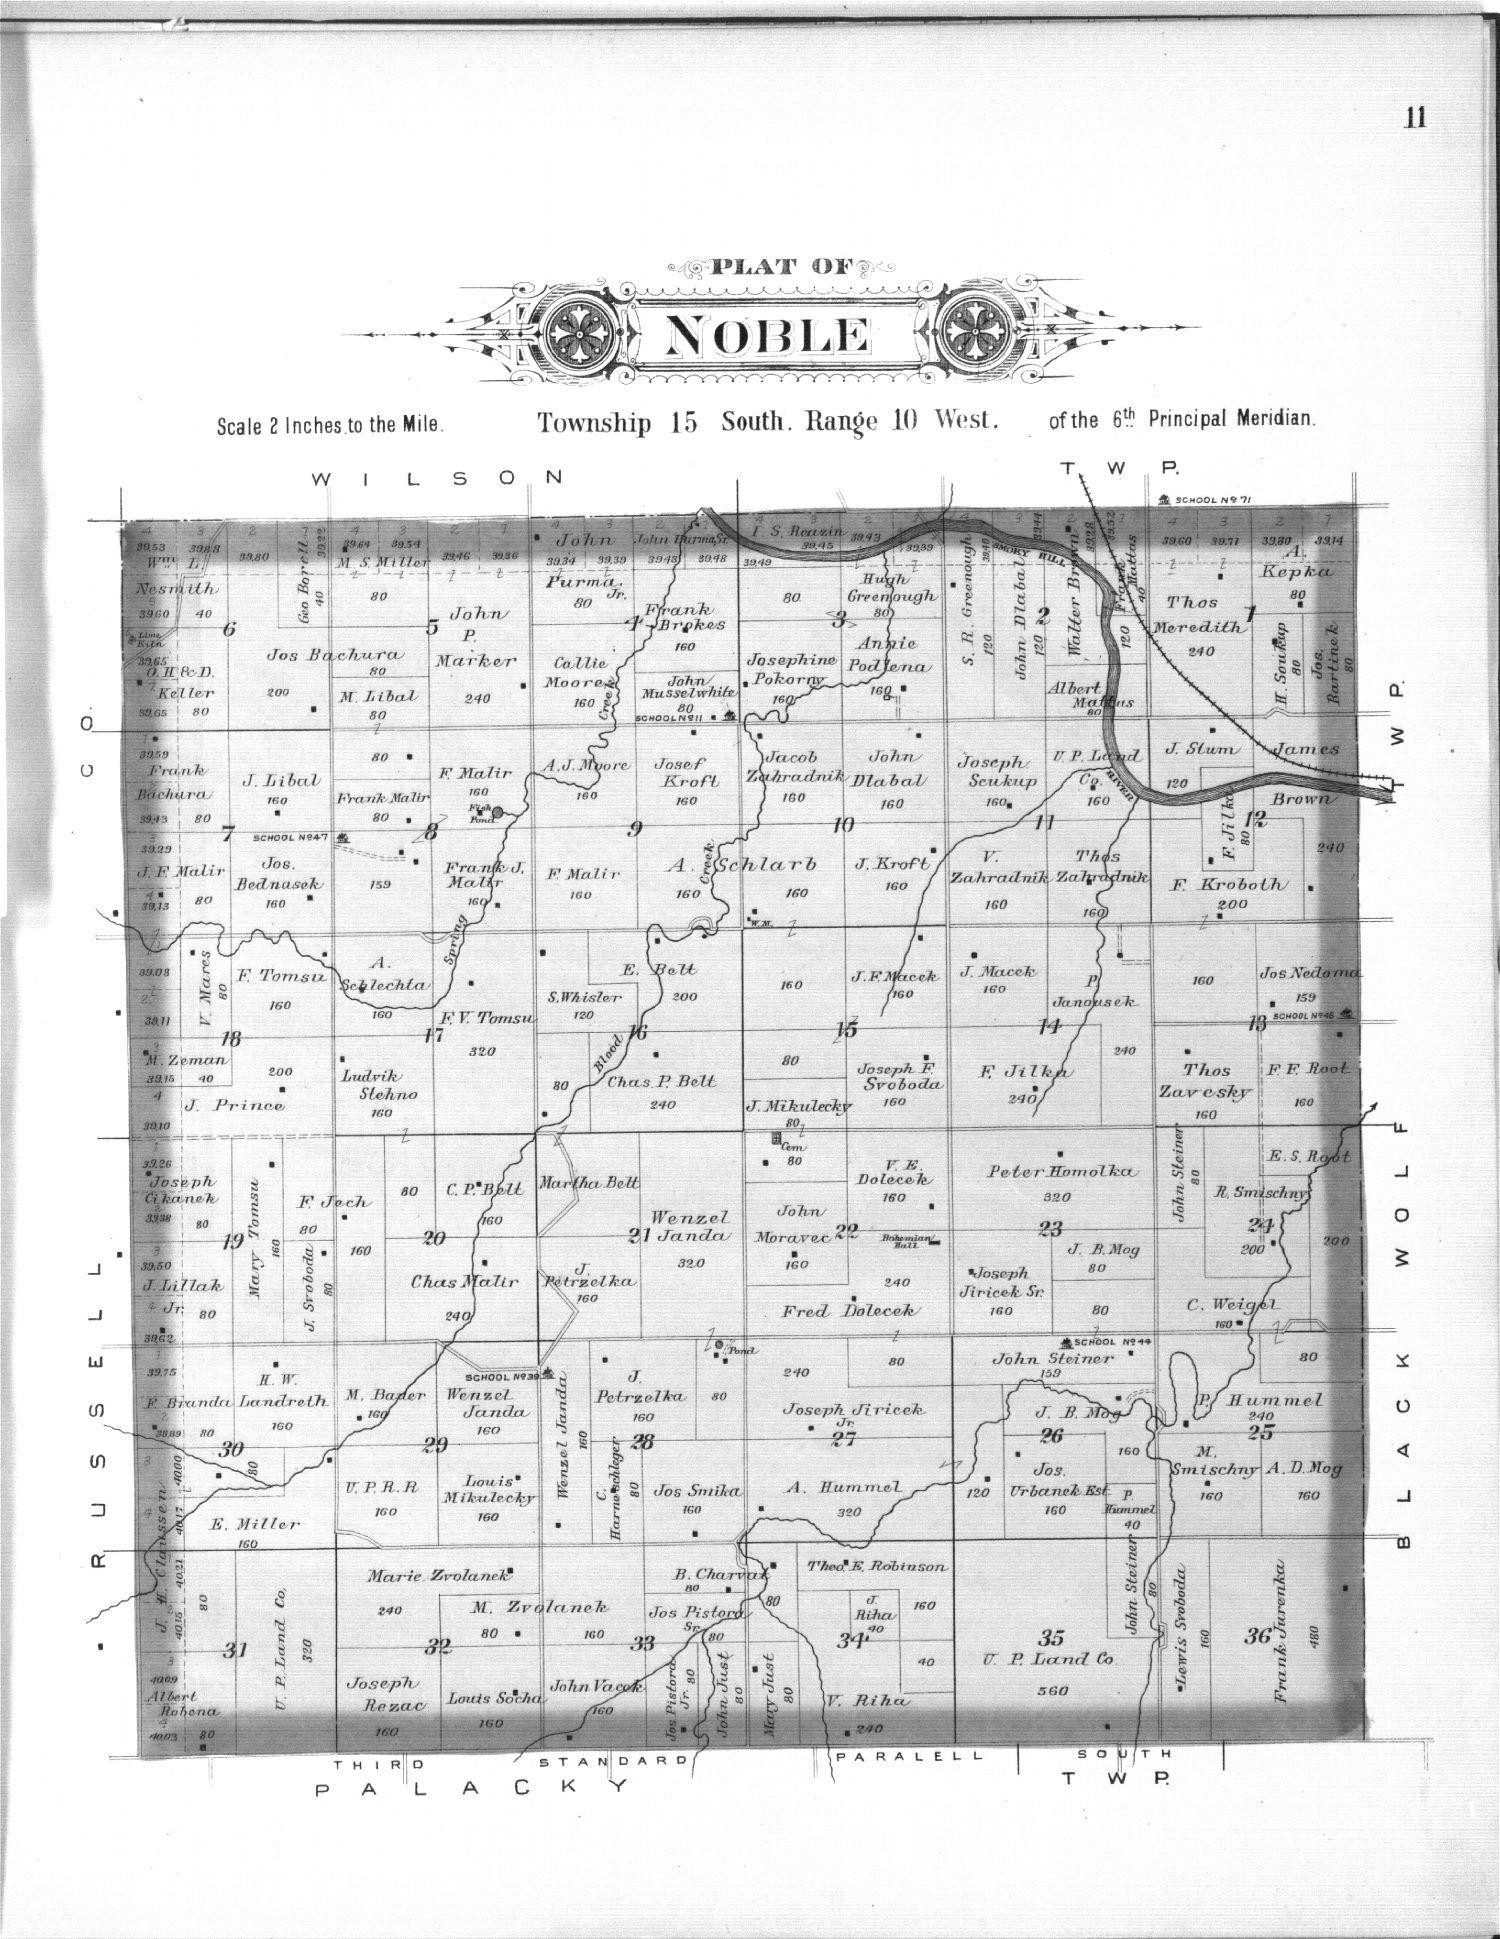 Plat book, Ellsworth County, Kansas - 11